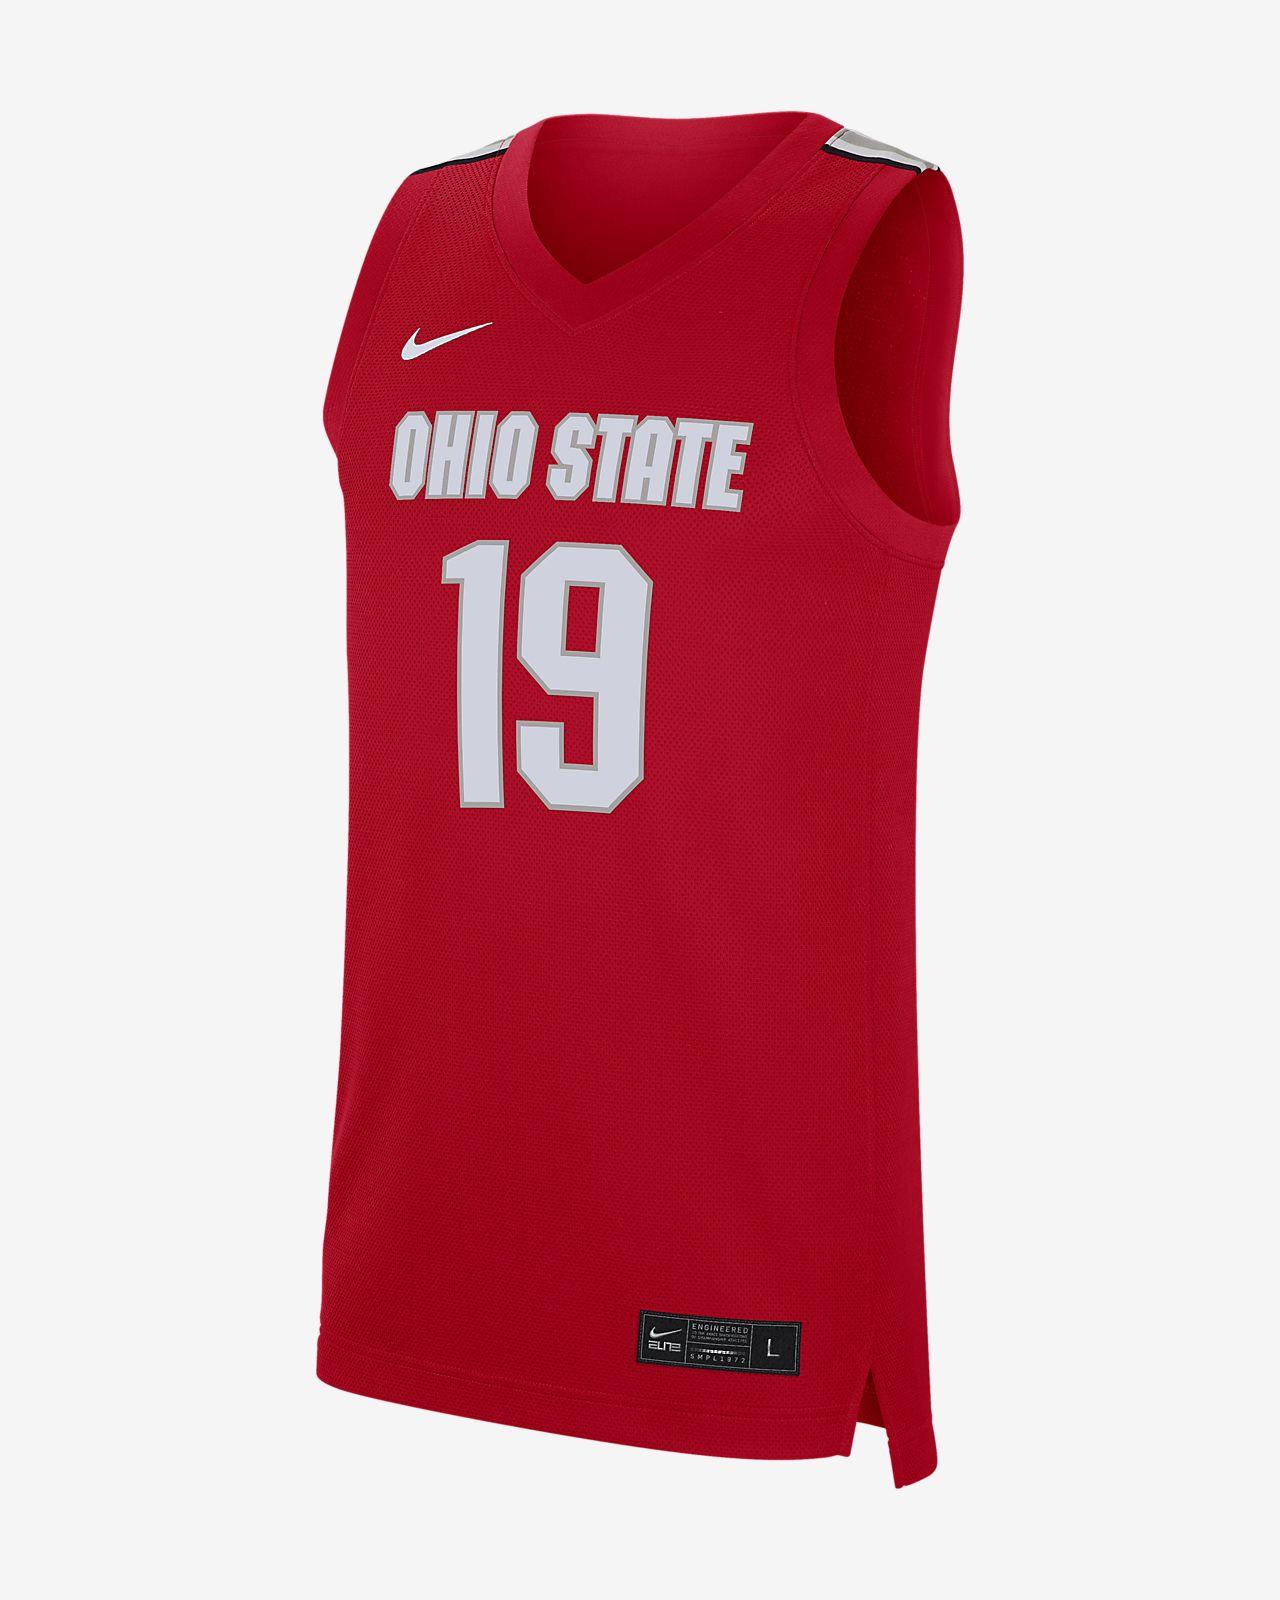 Nike College (Ohio State) Men's Basketball Jersey